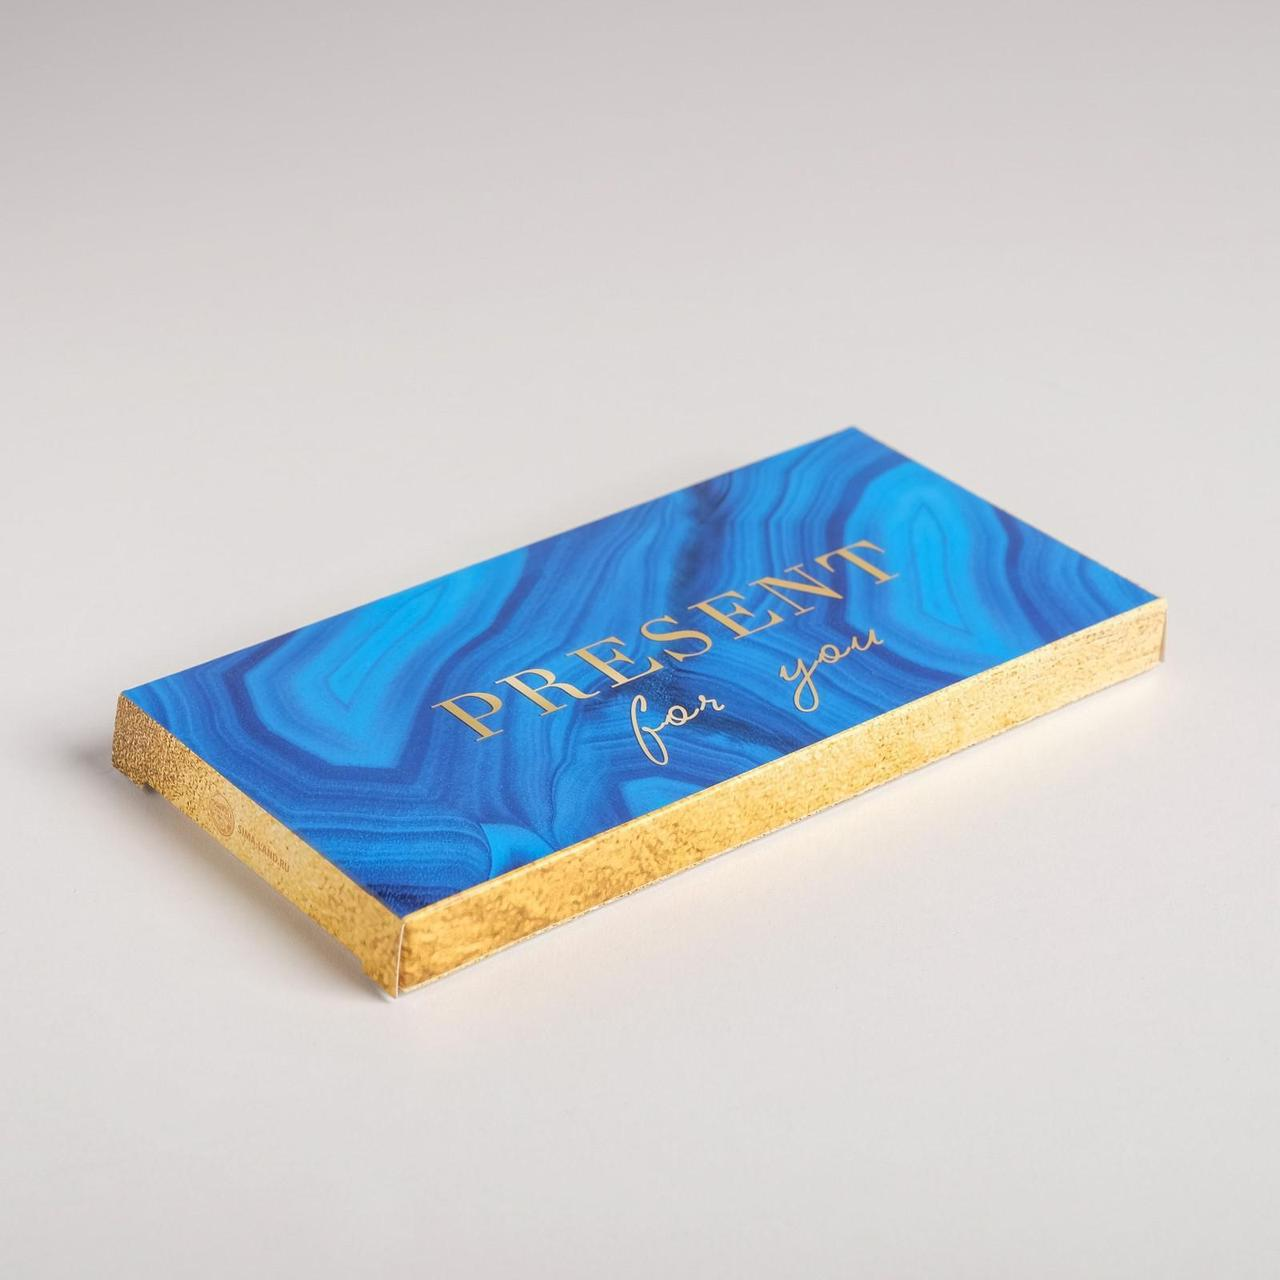 Коробка для шоколада Present, 17,3 × 8,8 × 1,5 см